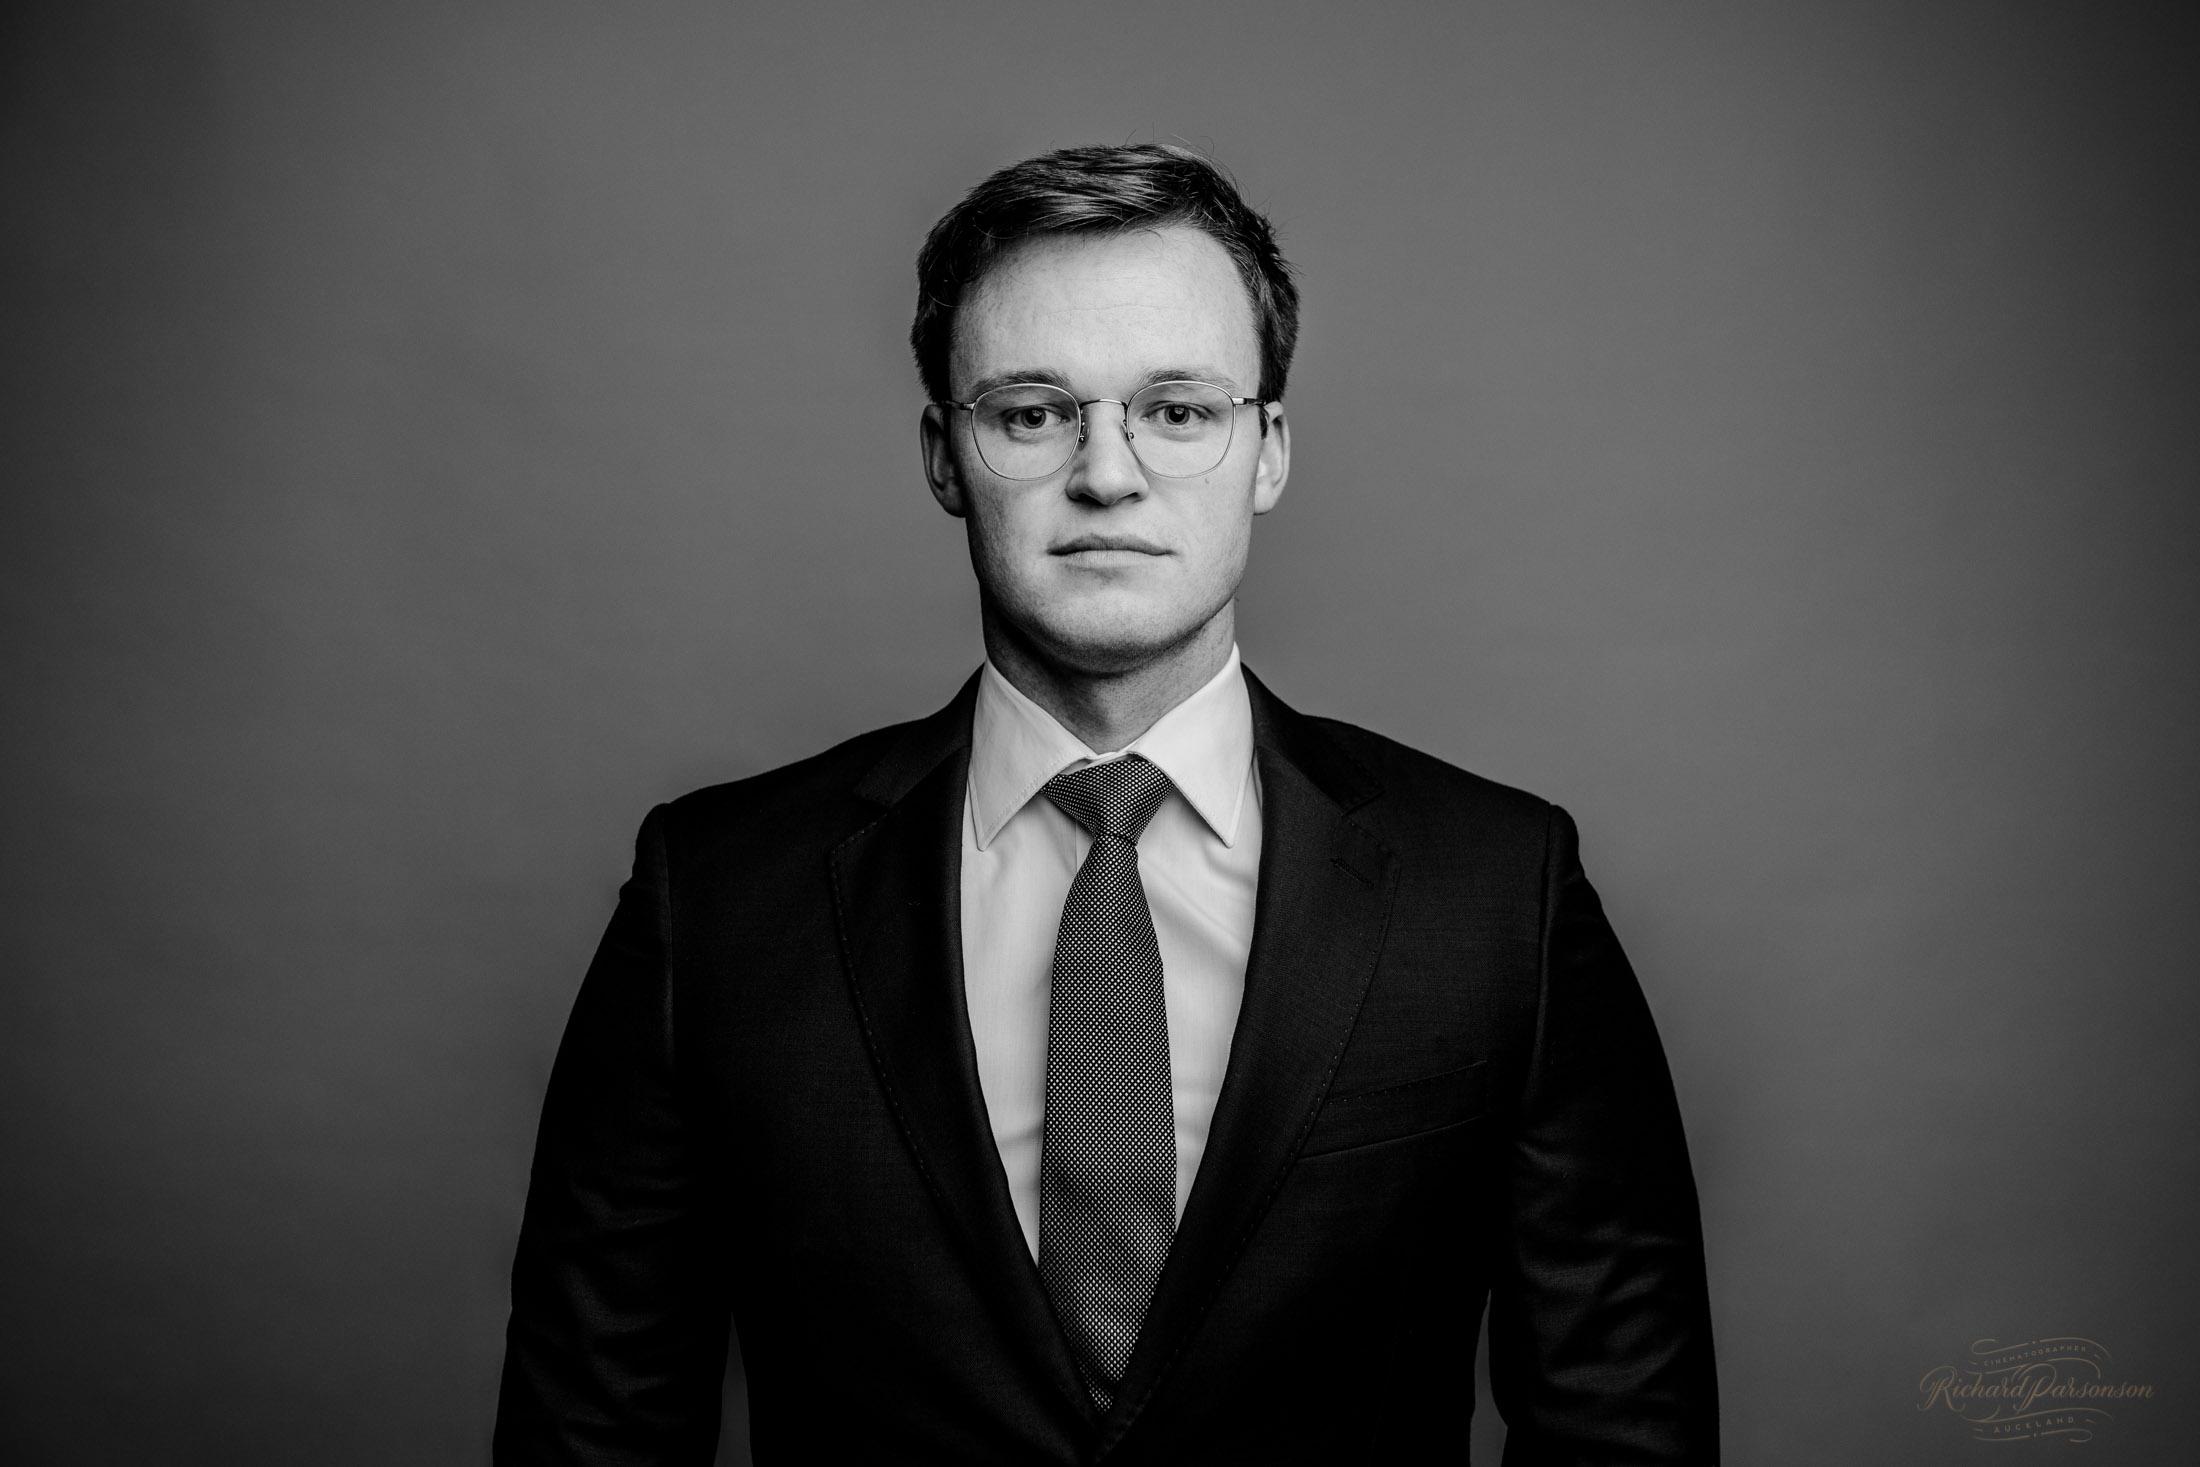 corporate portrait for business